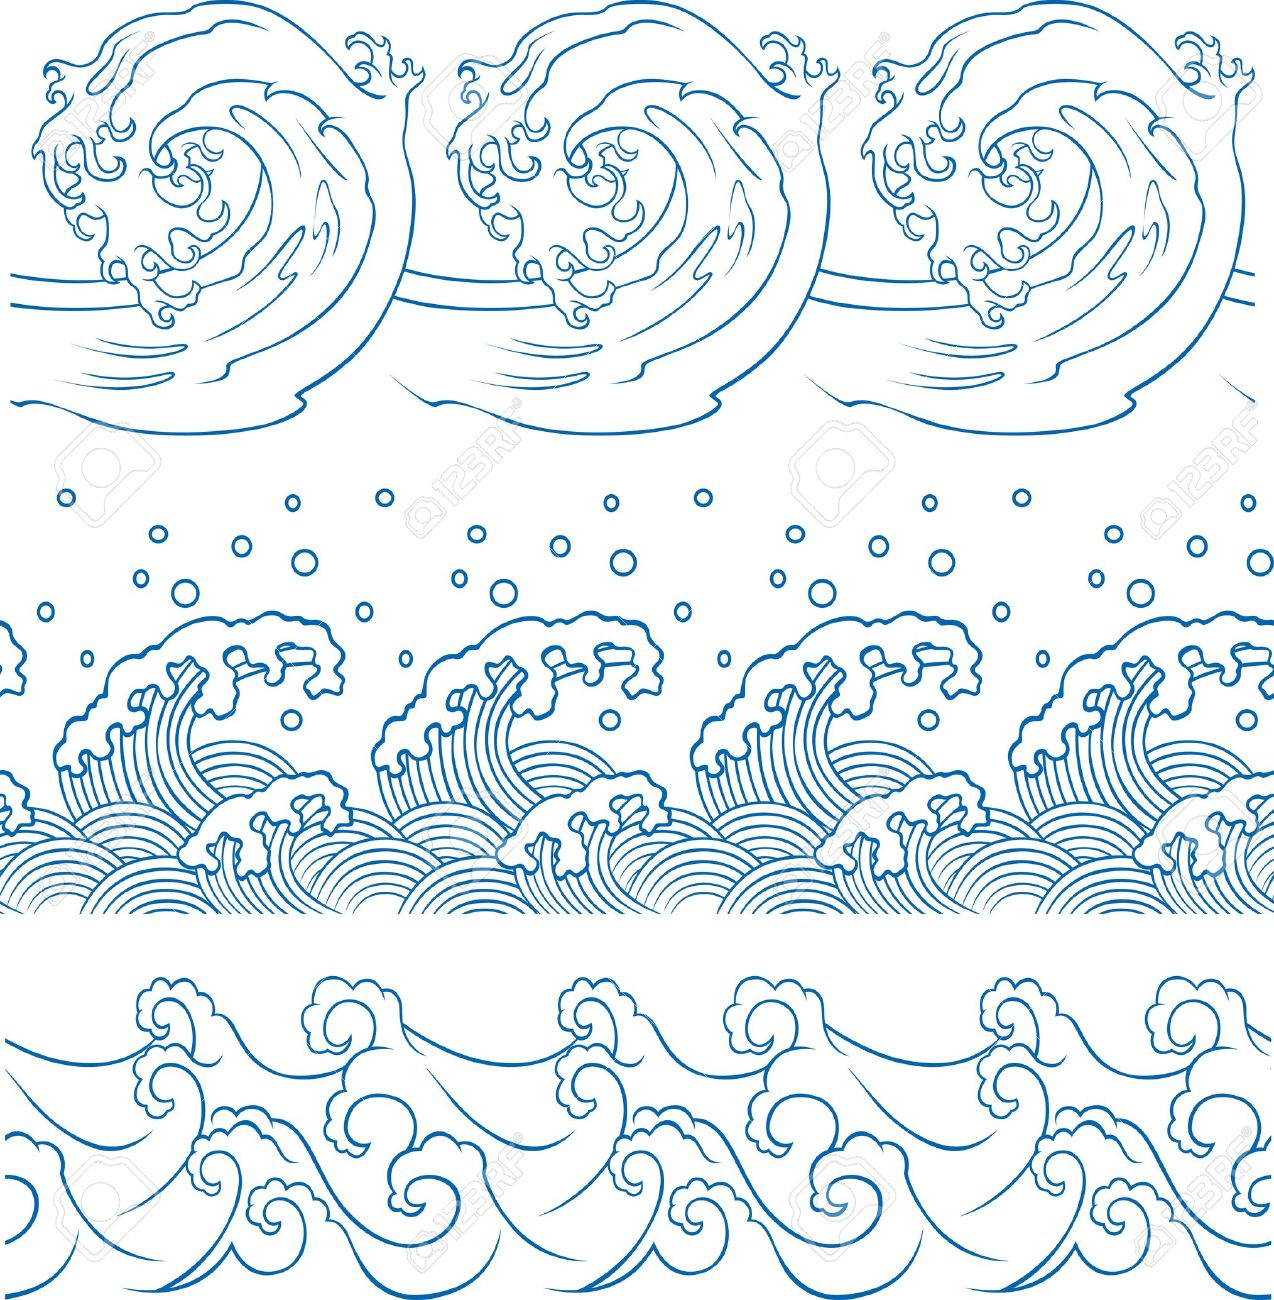 ocean wave repeated pattern Stock Vector - 10849204